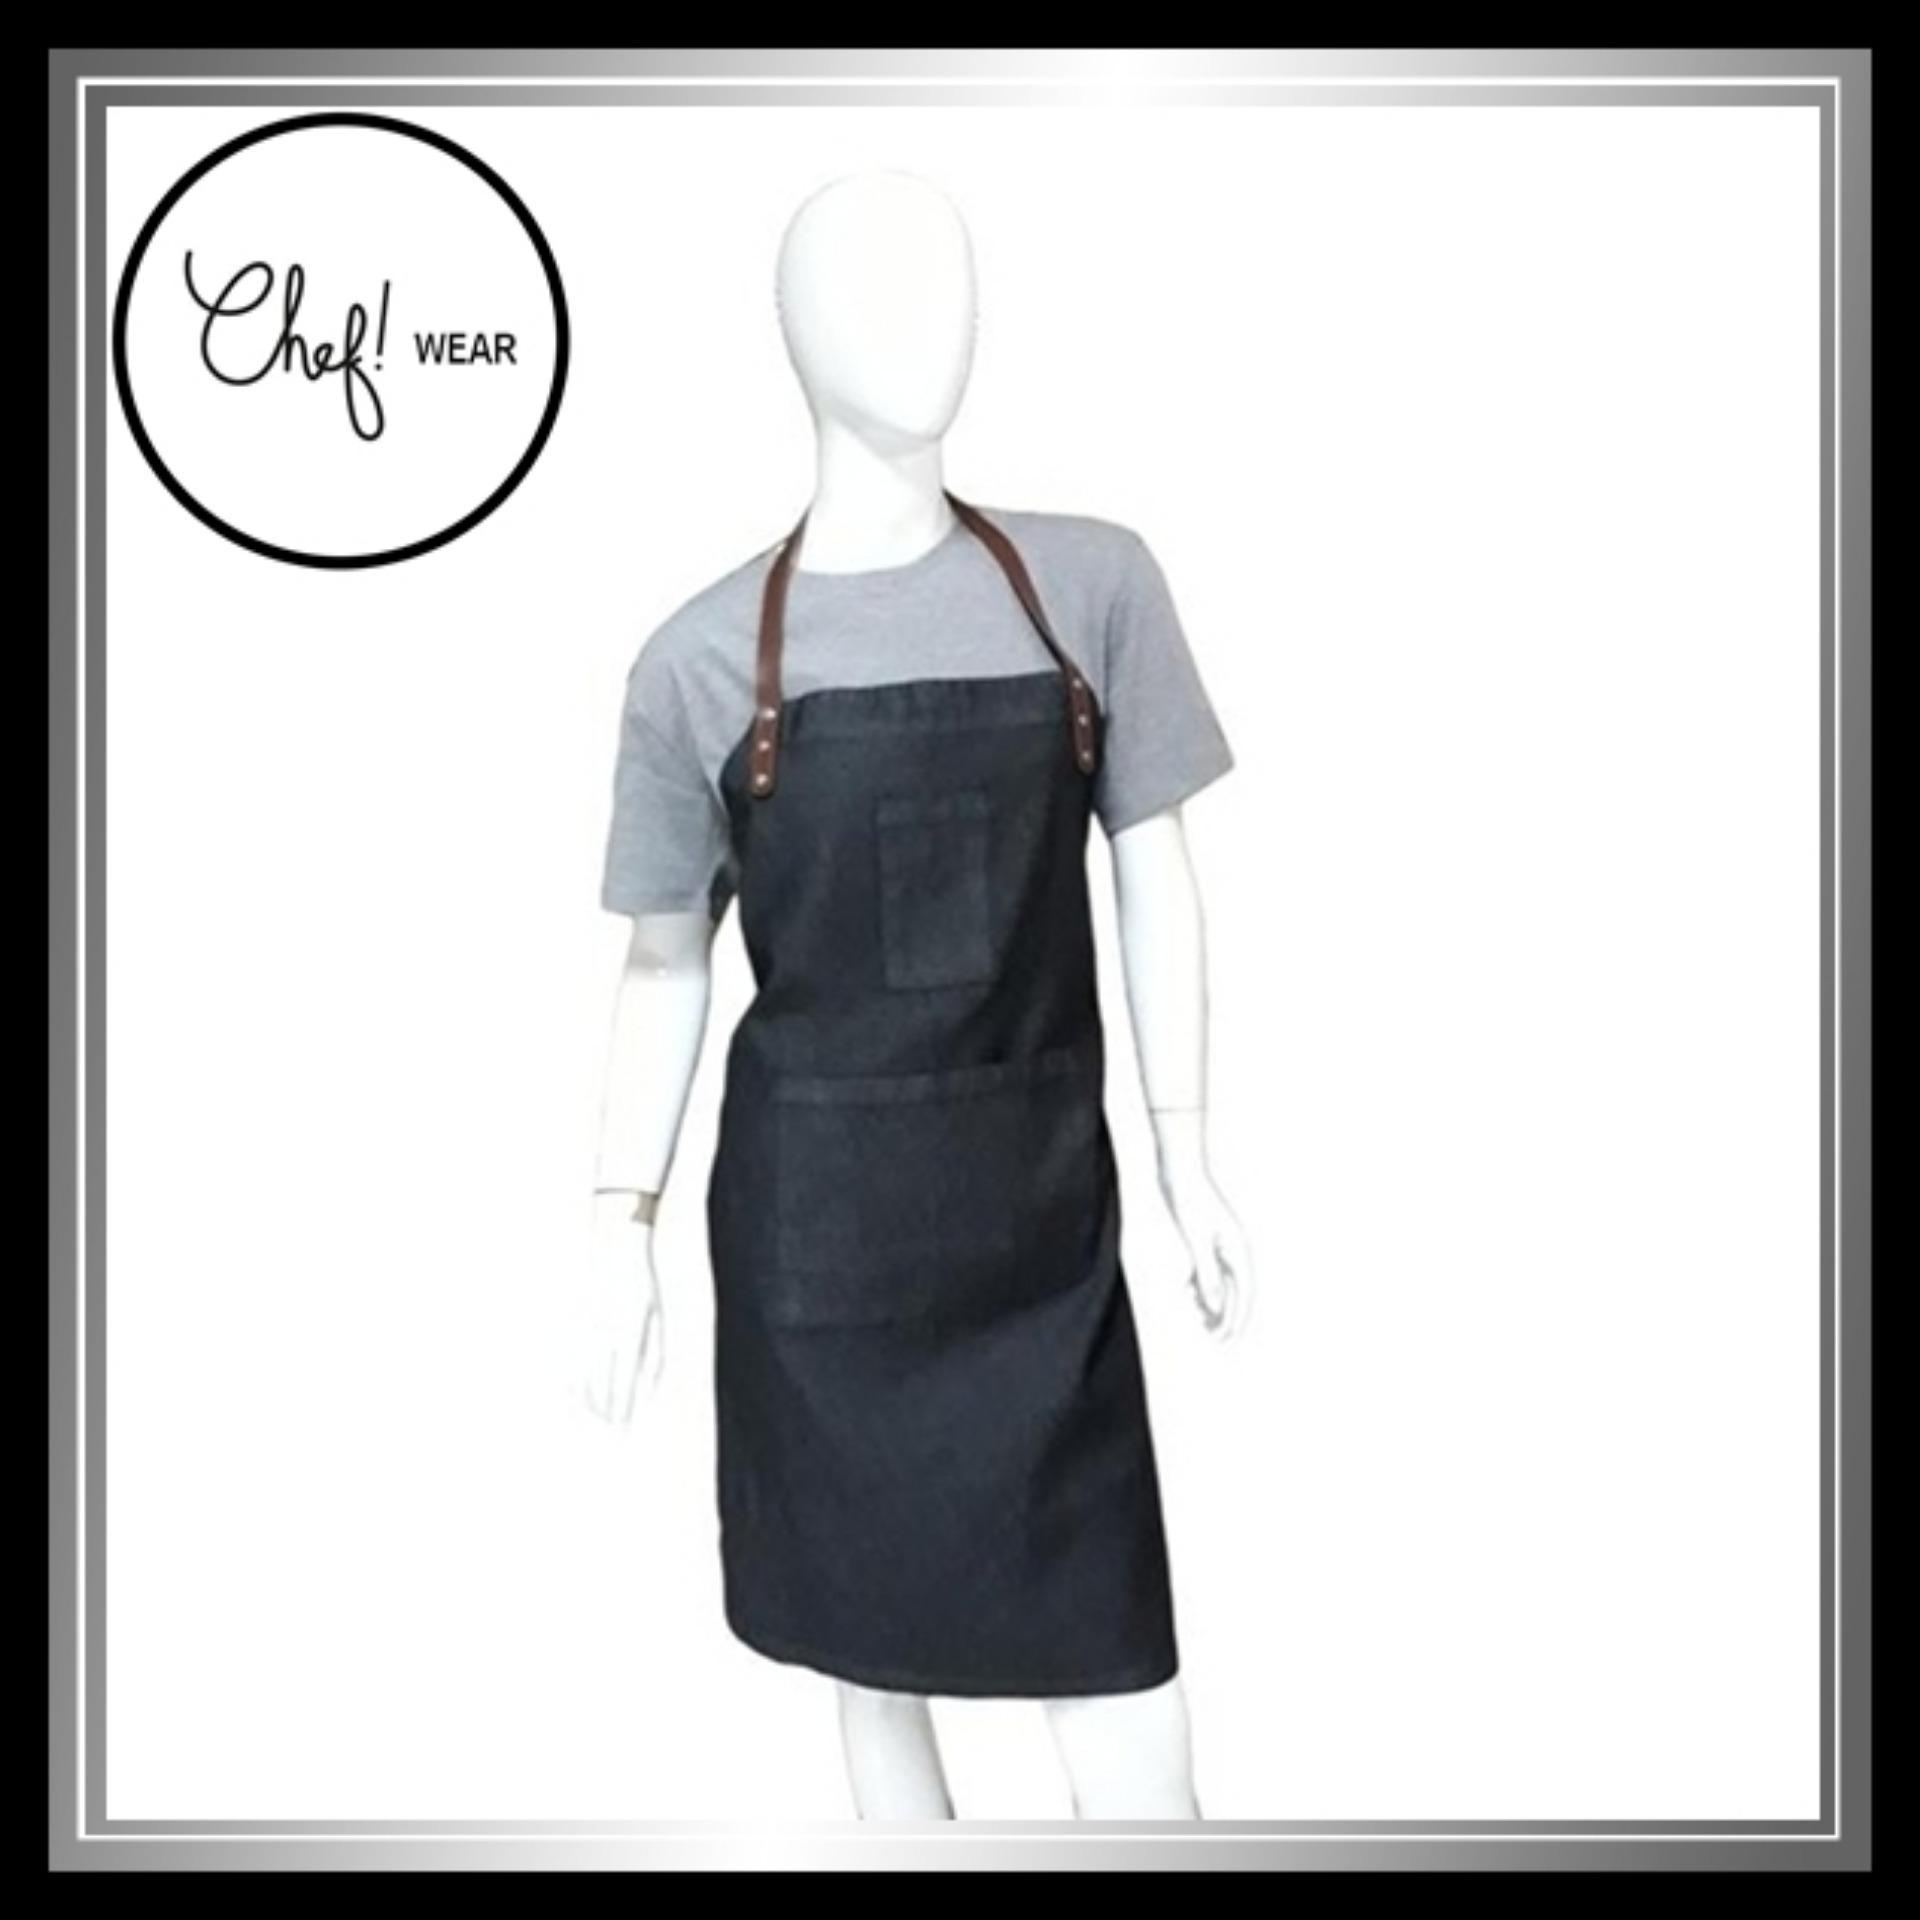 Jual Chef Wear Apron Celemek Denim Tali Kulit Kc Chef Wear